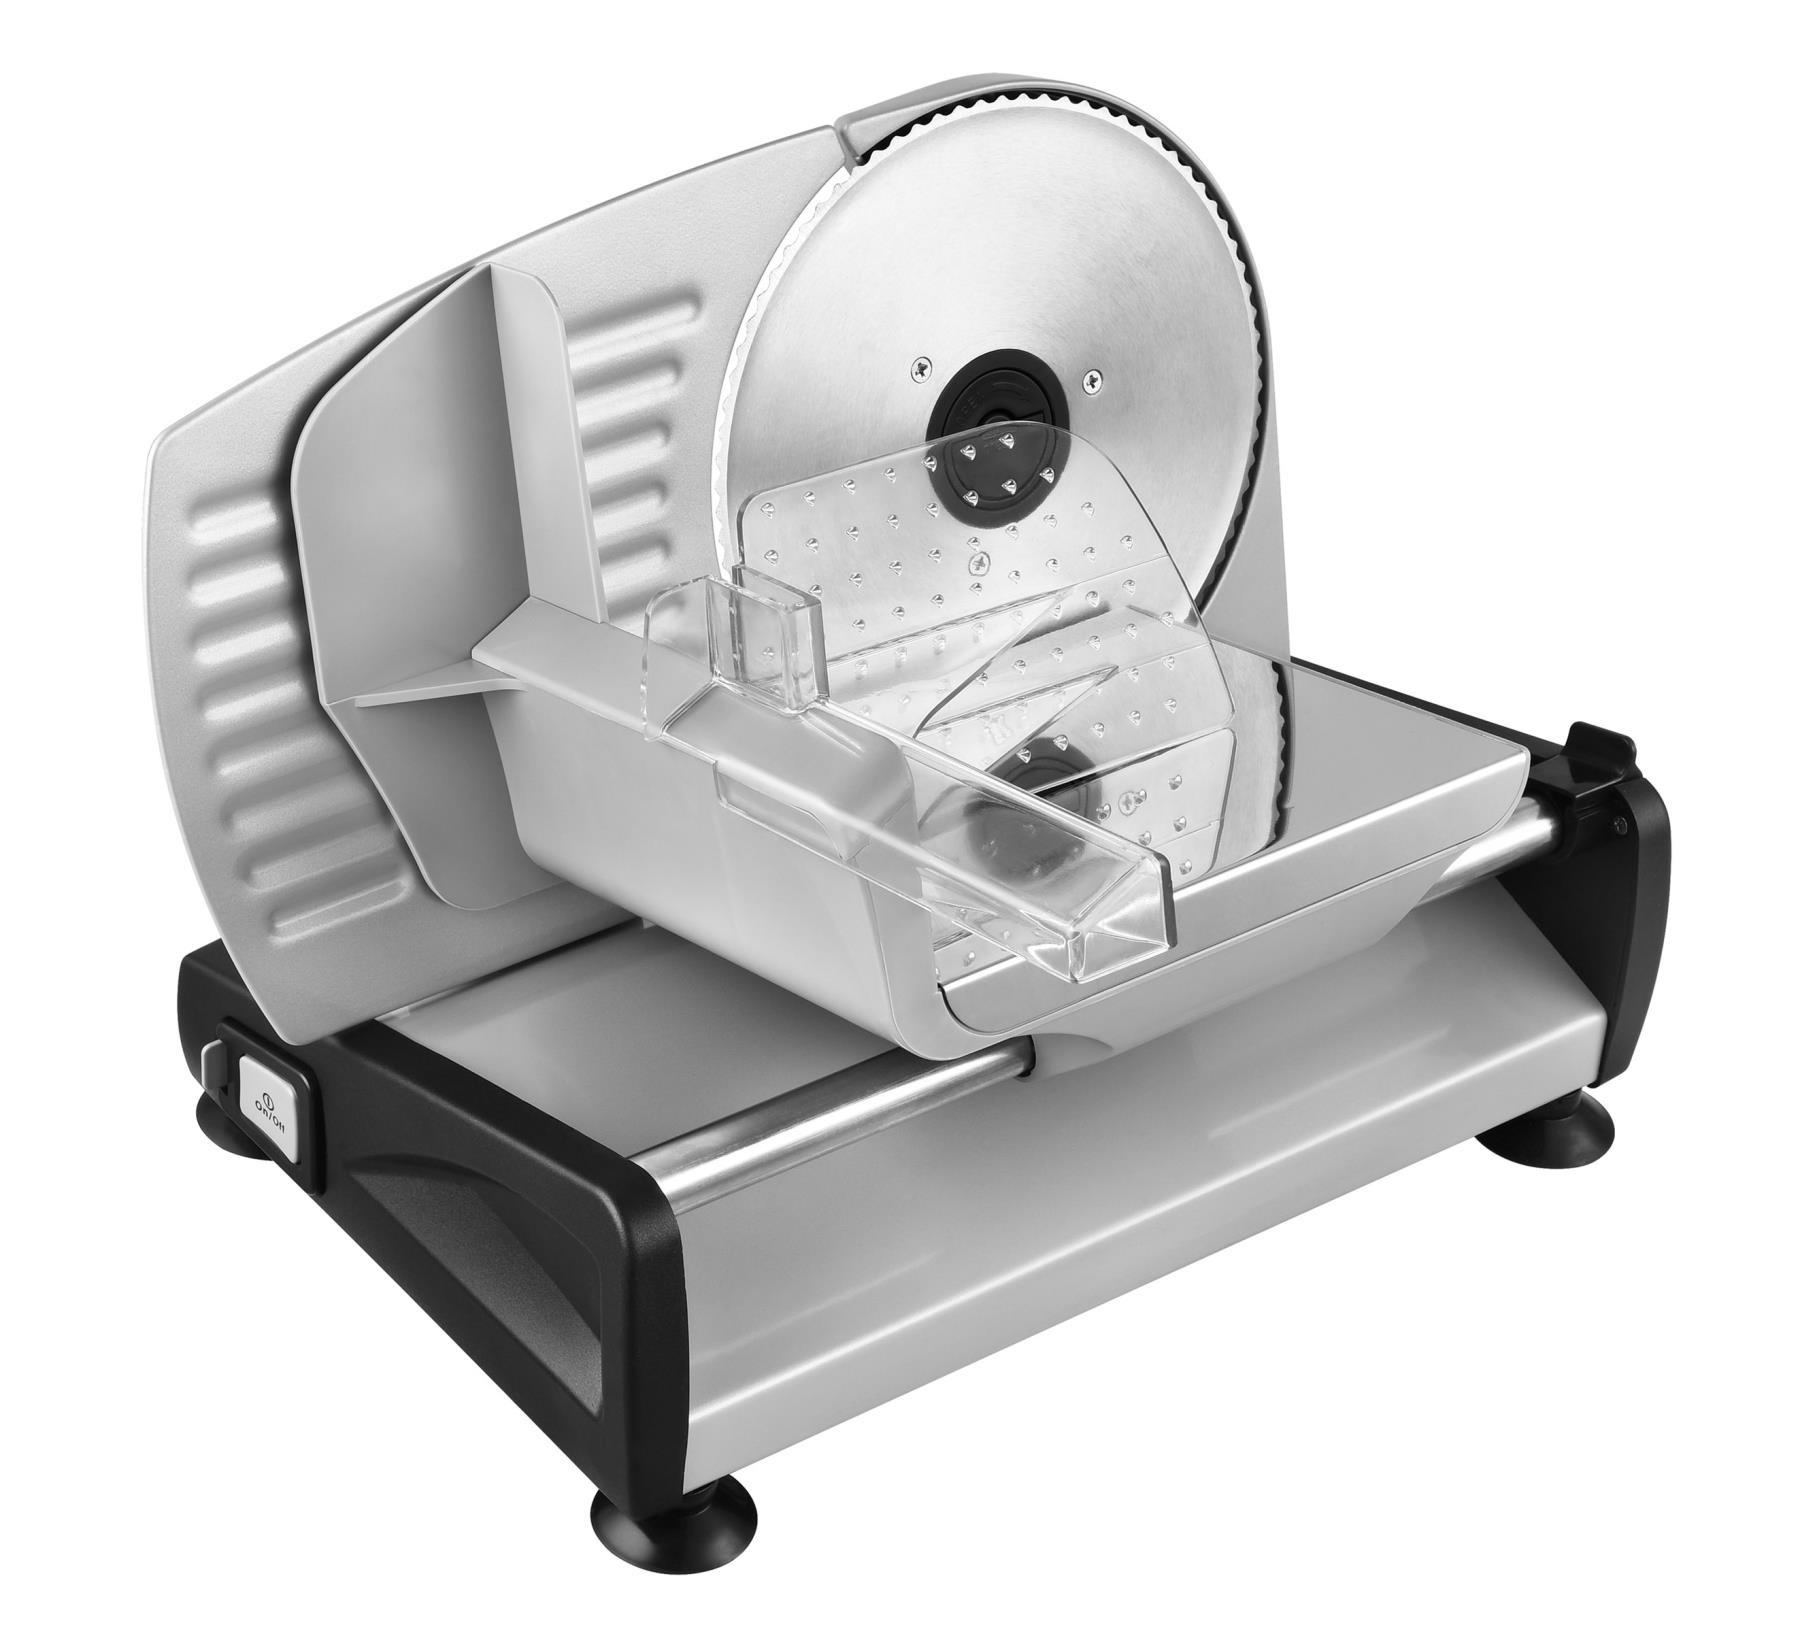 Metall Allesschneider Brotschneidemaschine Edelstahlmesser 19cm Silber*57918 002